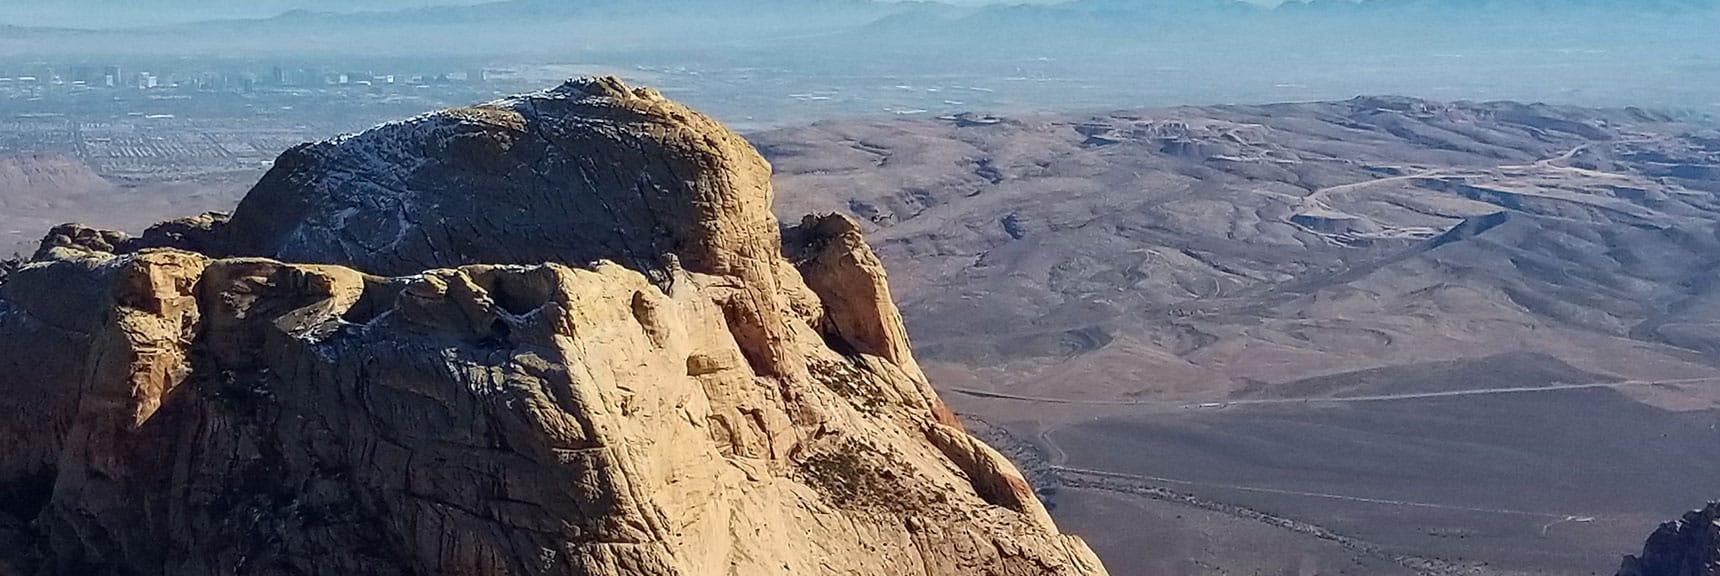 Bridge Mountain Seen from Goat Rock, Red Rock National Park, Nevada